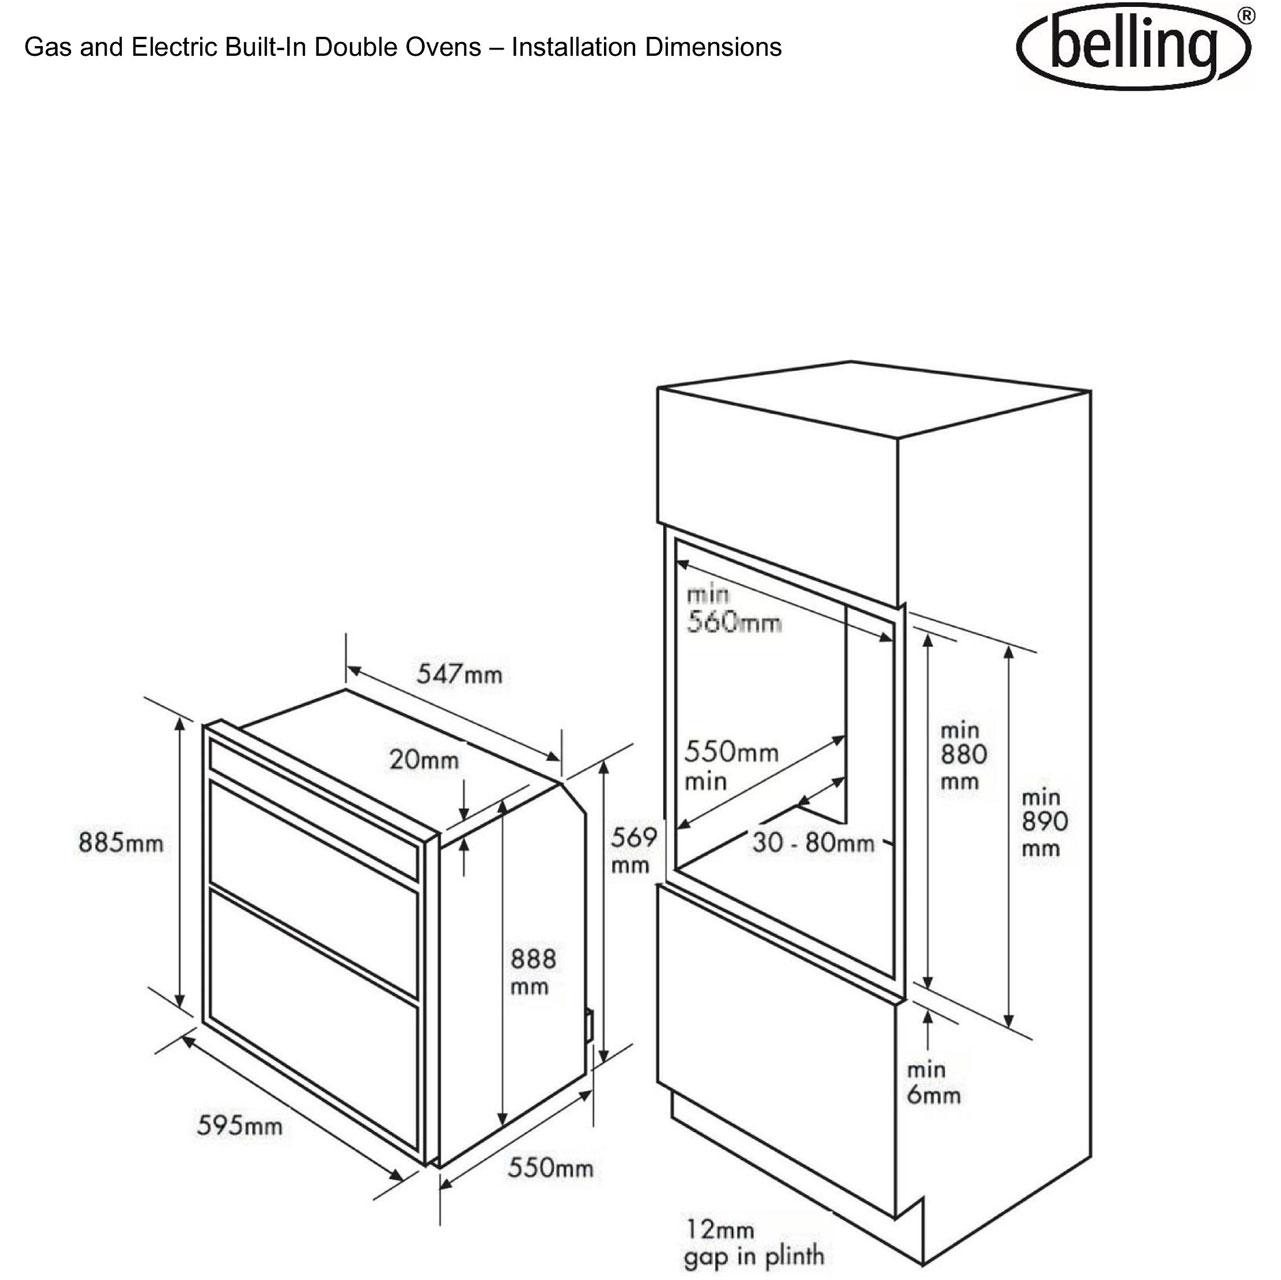 fcd safc ii wiring help 2000 kenworth fuse panel diagram, Wiring diagram